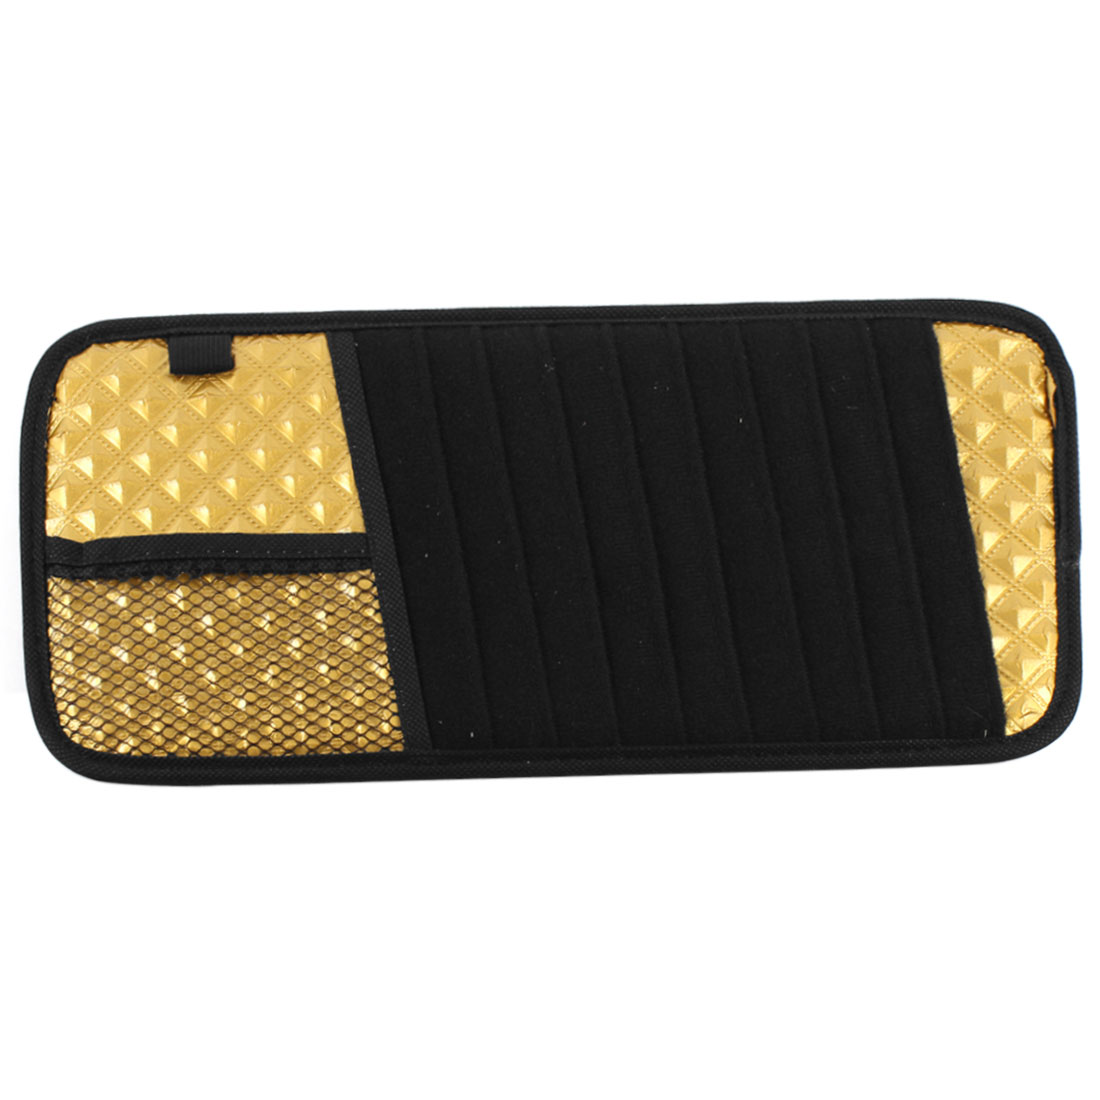 10 Slots Visor CD DVD Disk Bag Holder Organizer Pocket Golden Tone Black for Car